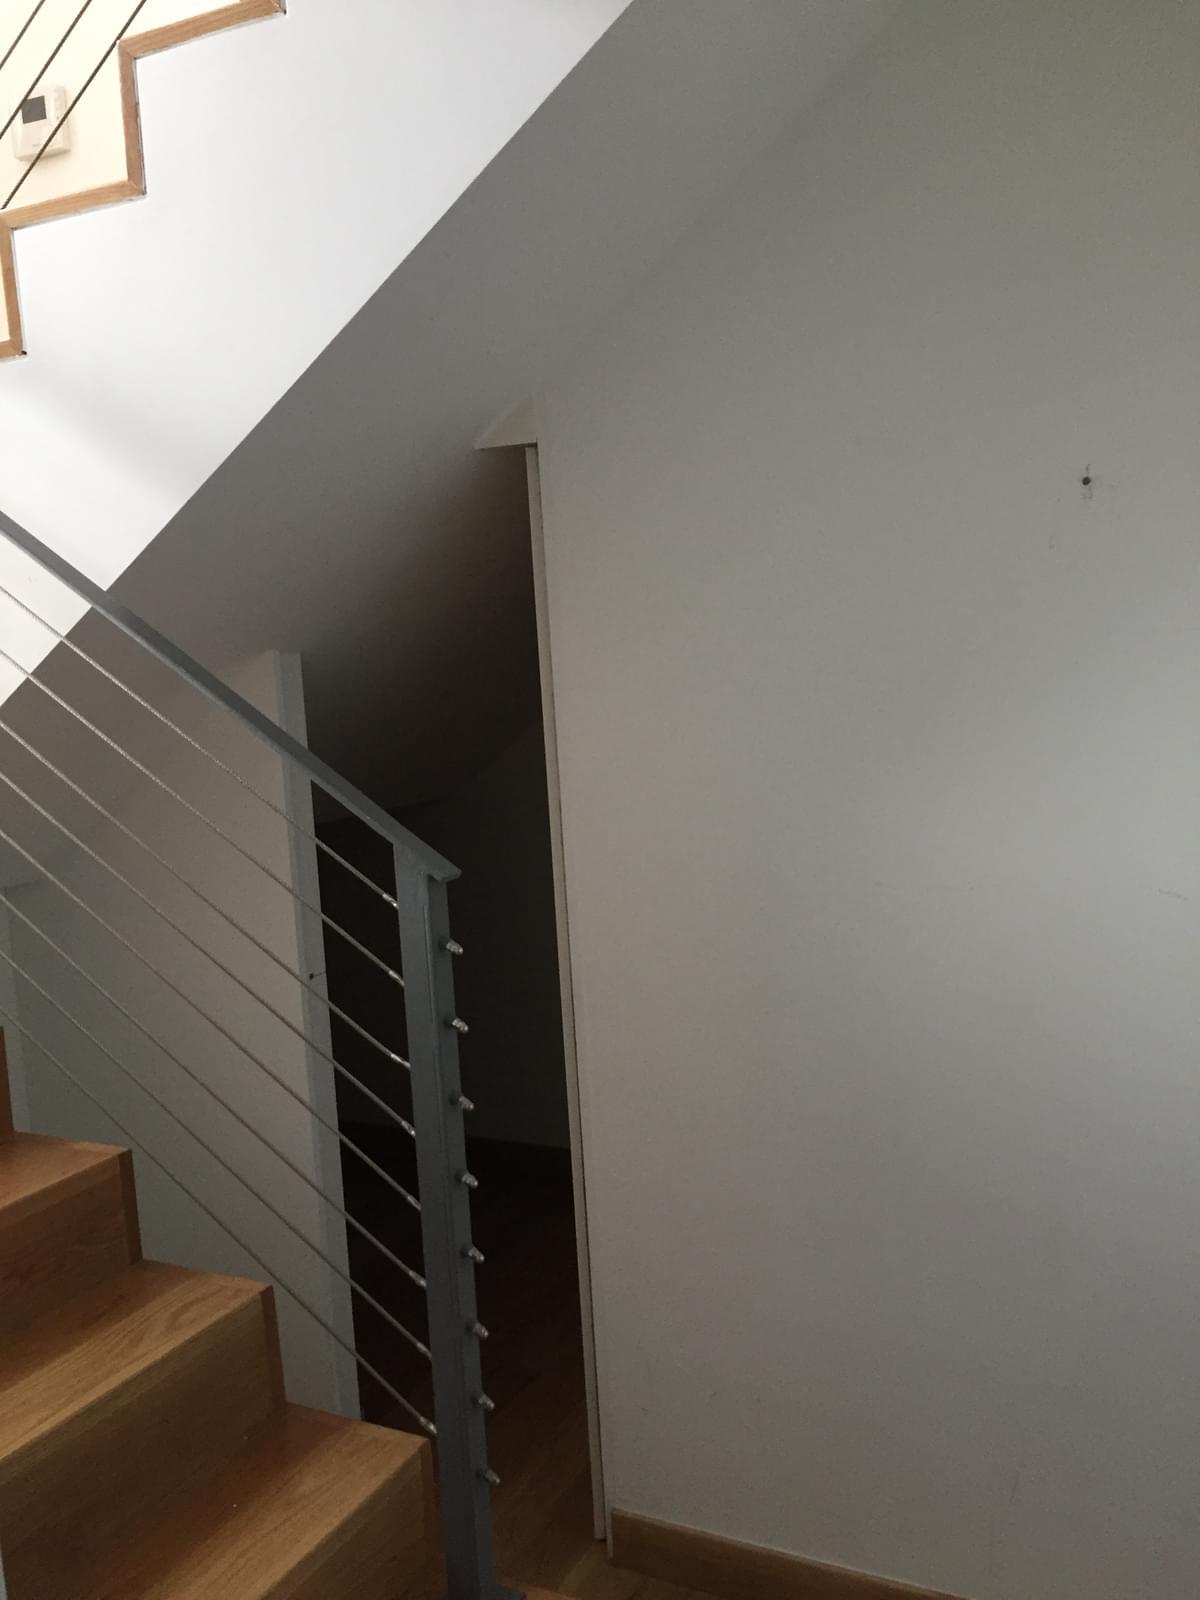 pf19228-apartamento-t1-cascais-f4dc249a-769c-4e66-a776-14ca4c71ac2b